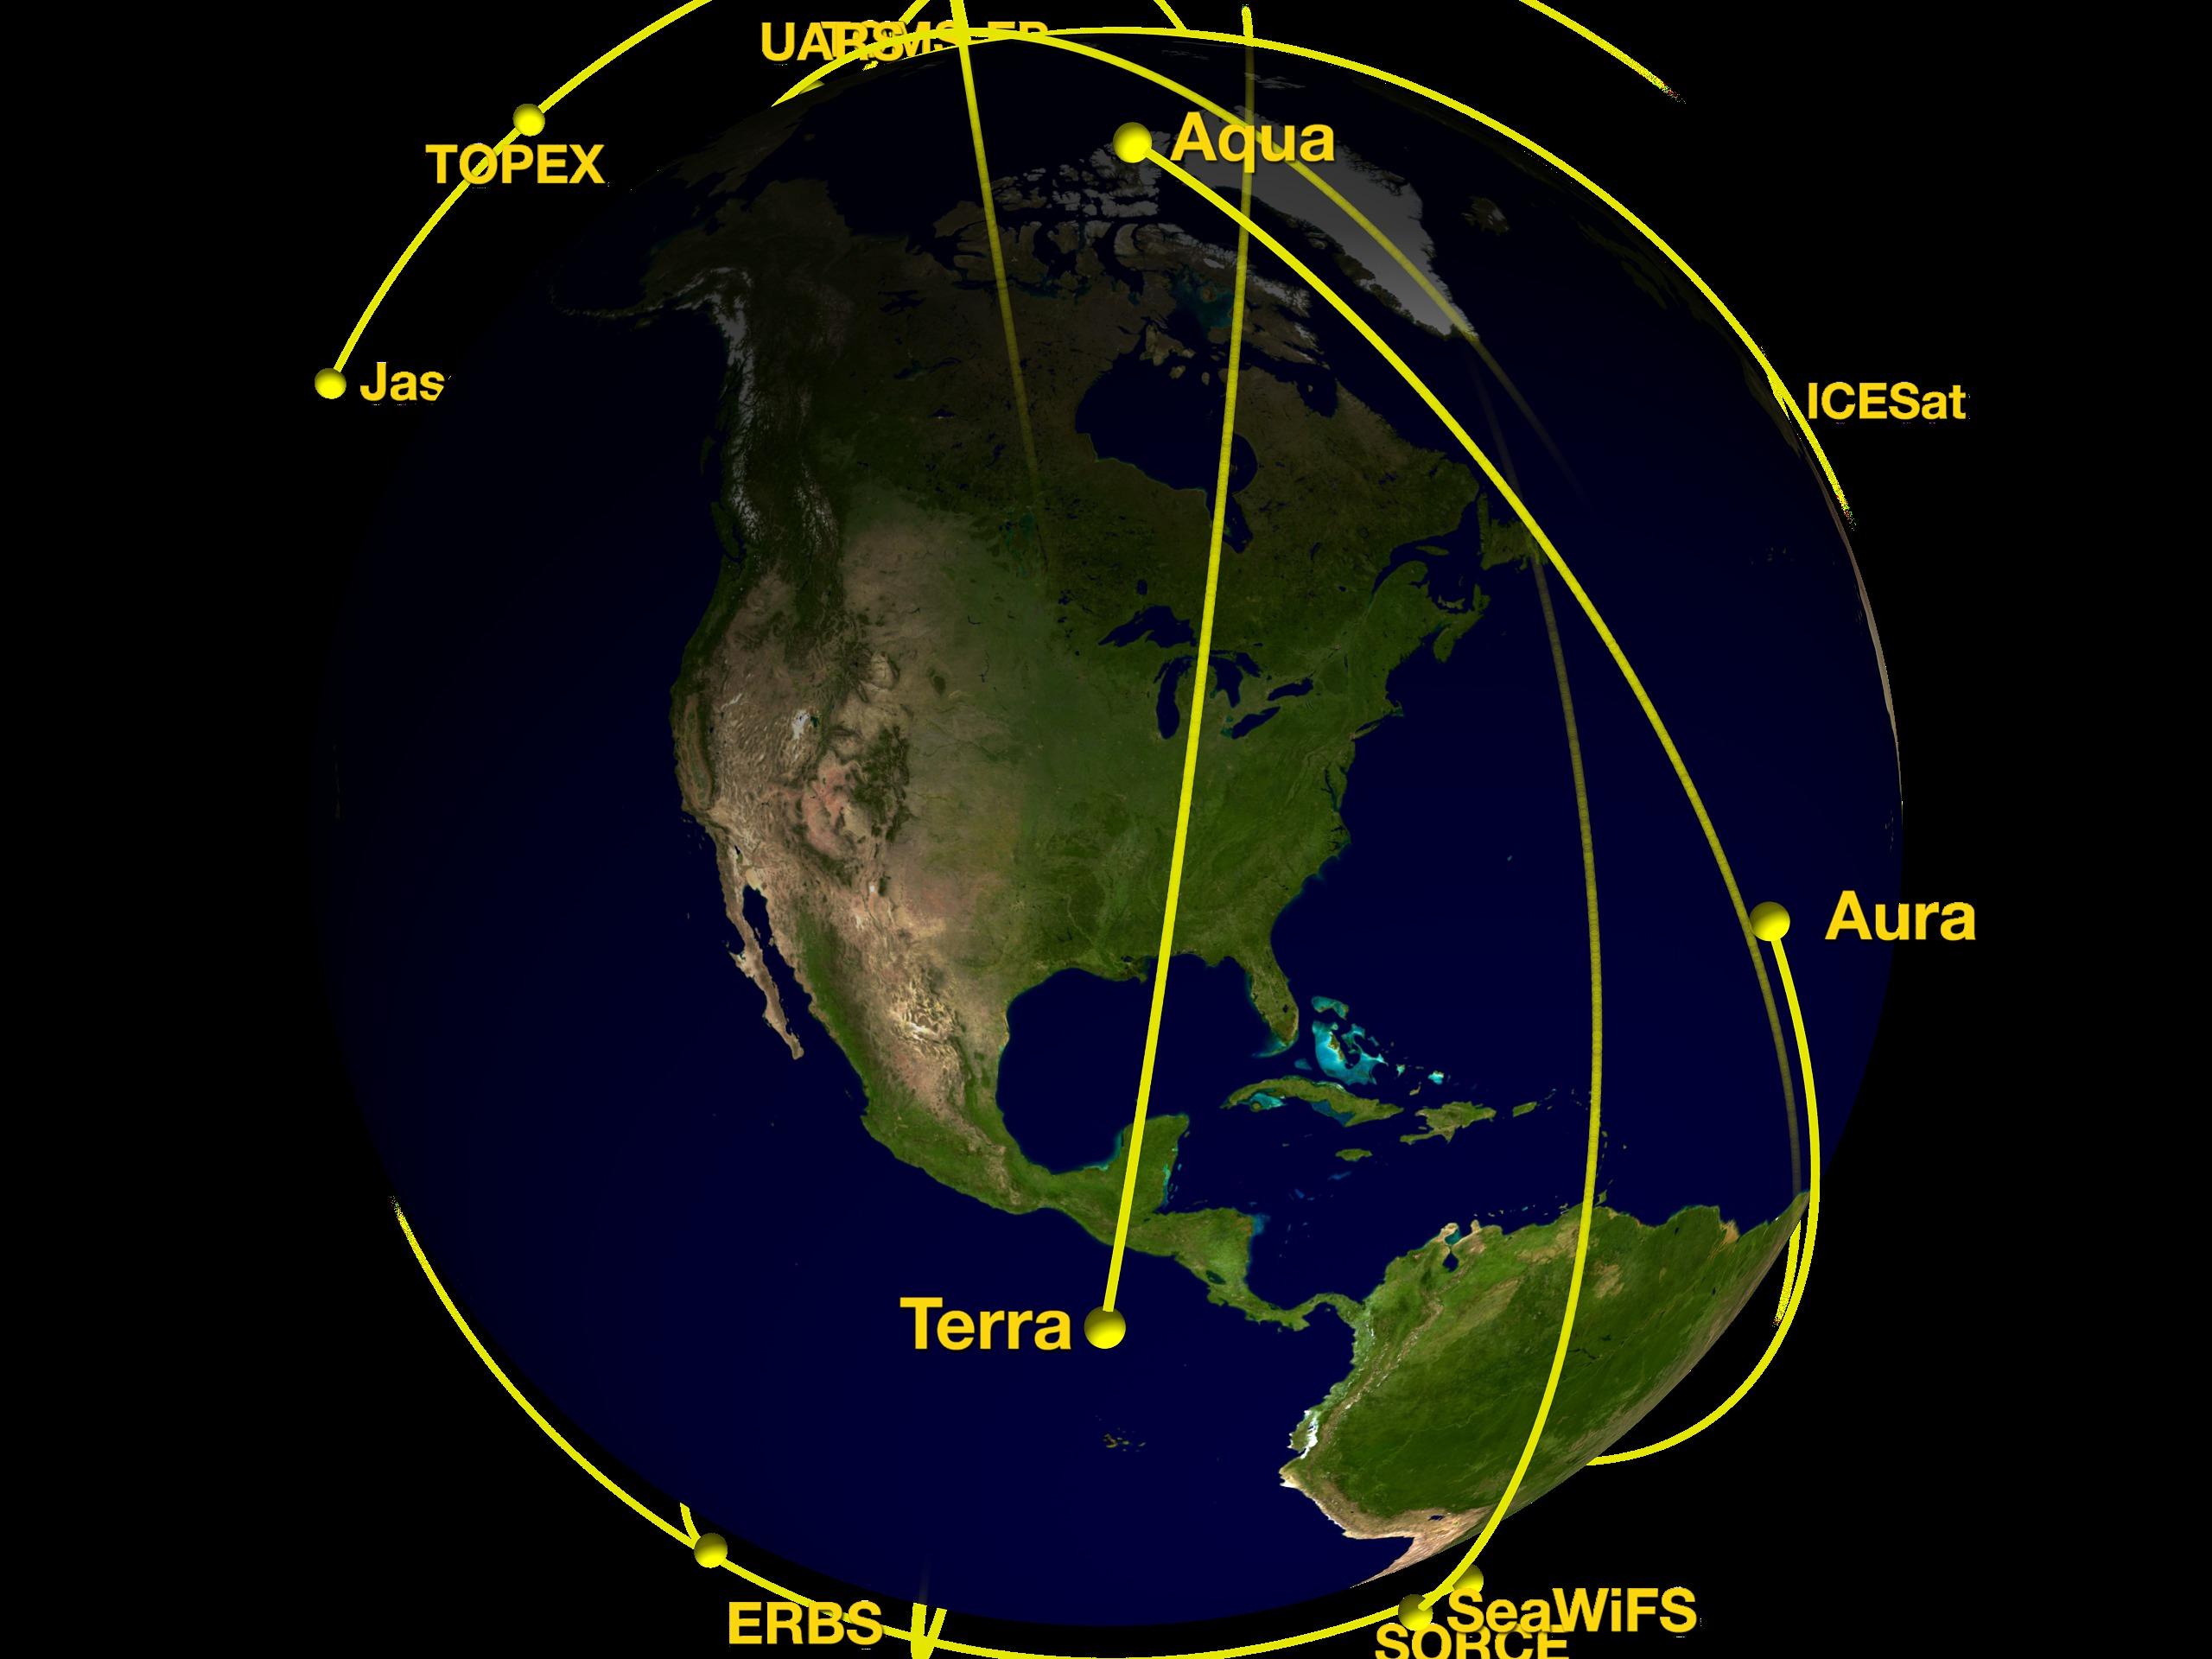 svs nasa s orbiting earth observing fleet includes aura